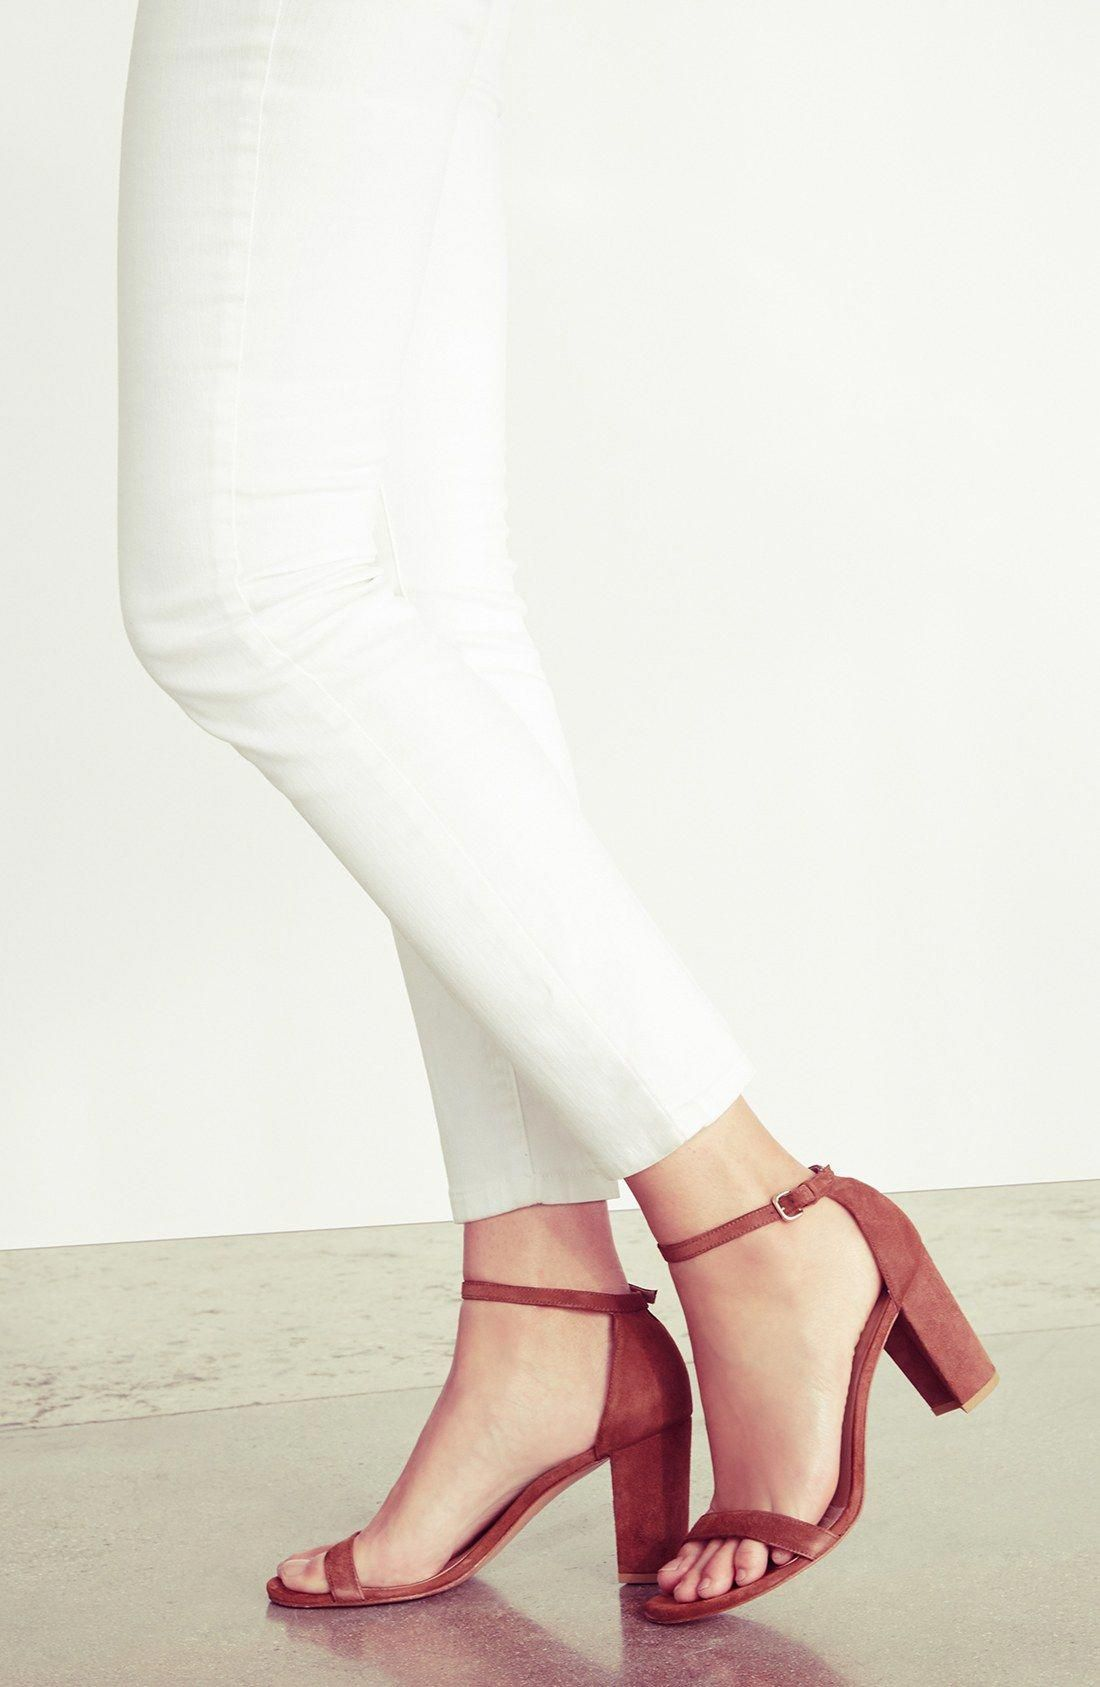 338588c8fea7 Stuart Weitzman  NearlyNude  Ankle Strap Sandal (Women)  StuartWeitzman